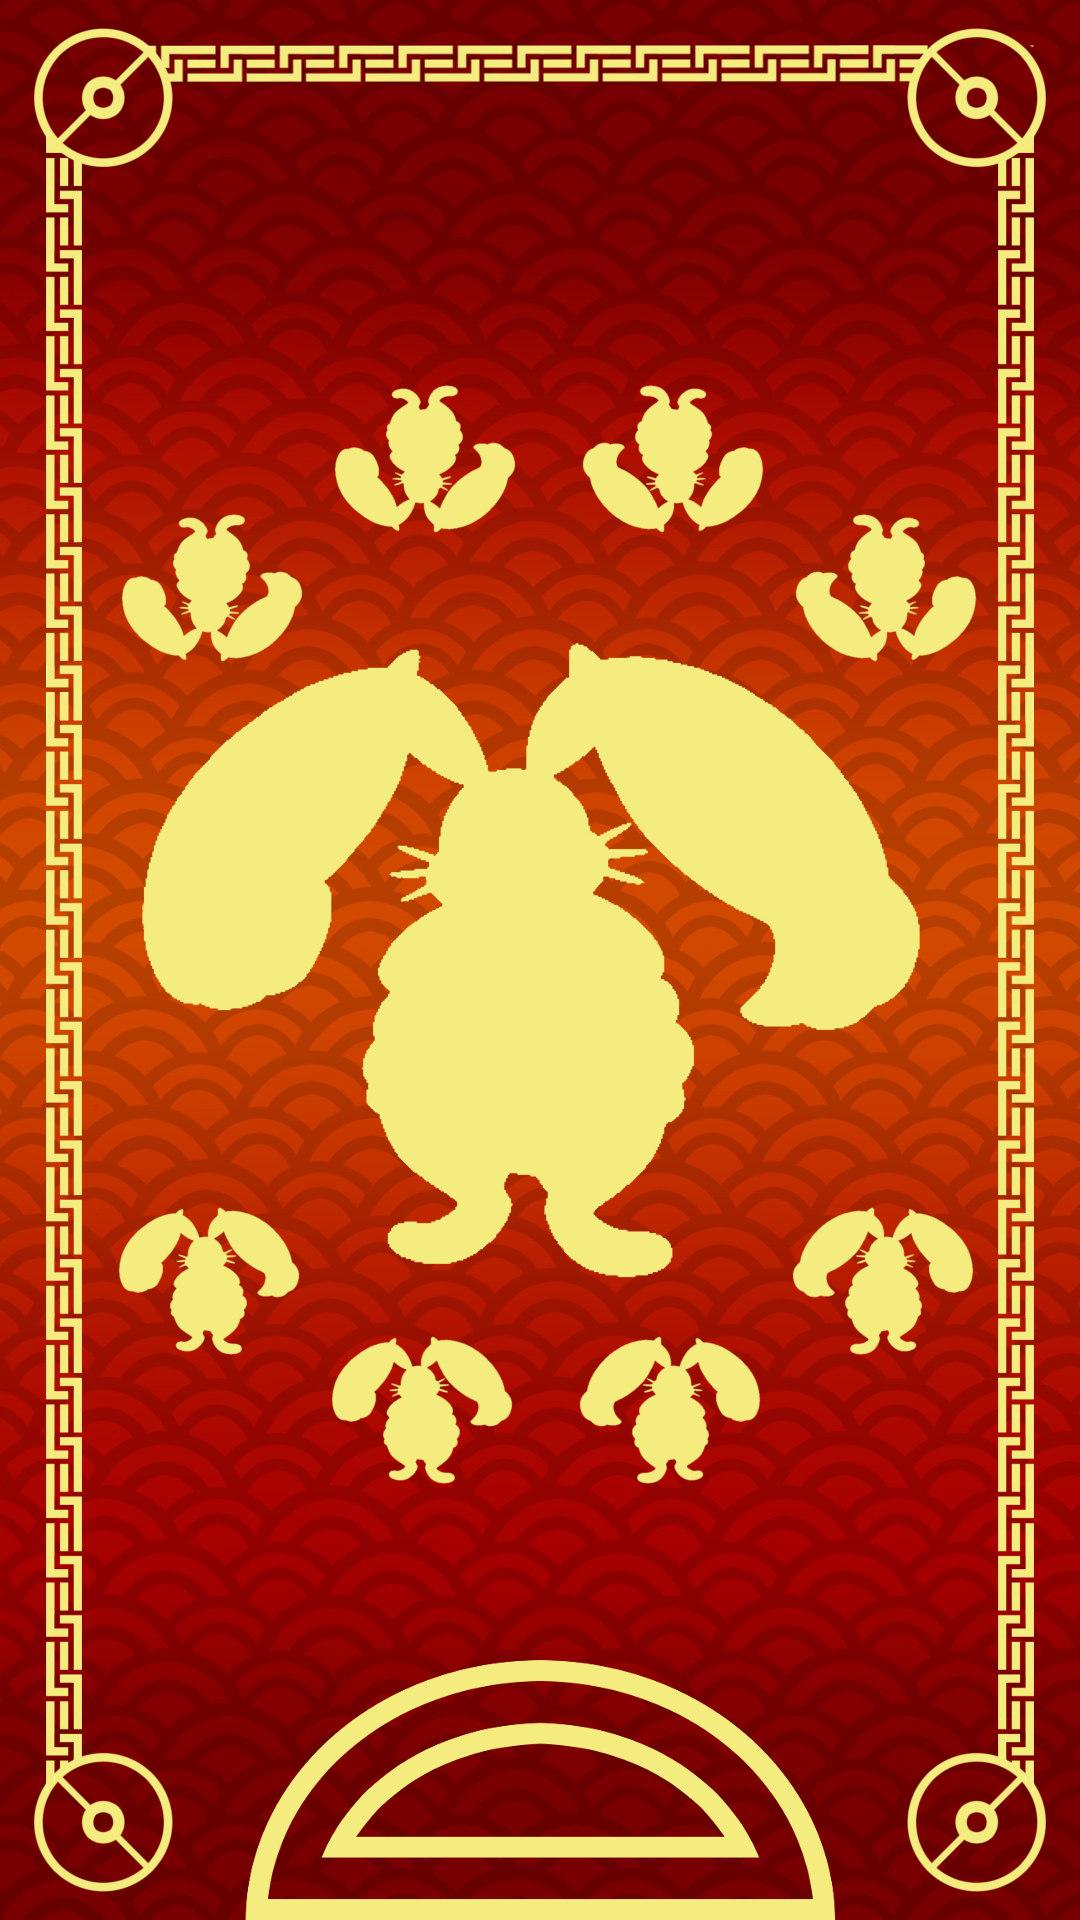 Hase - Grebbit